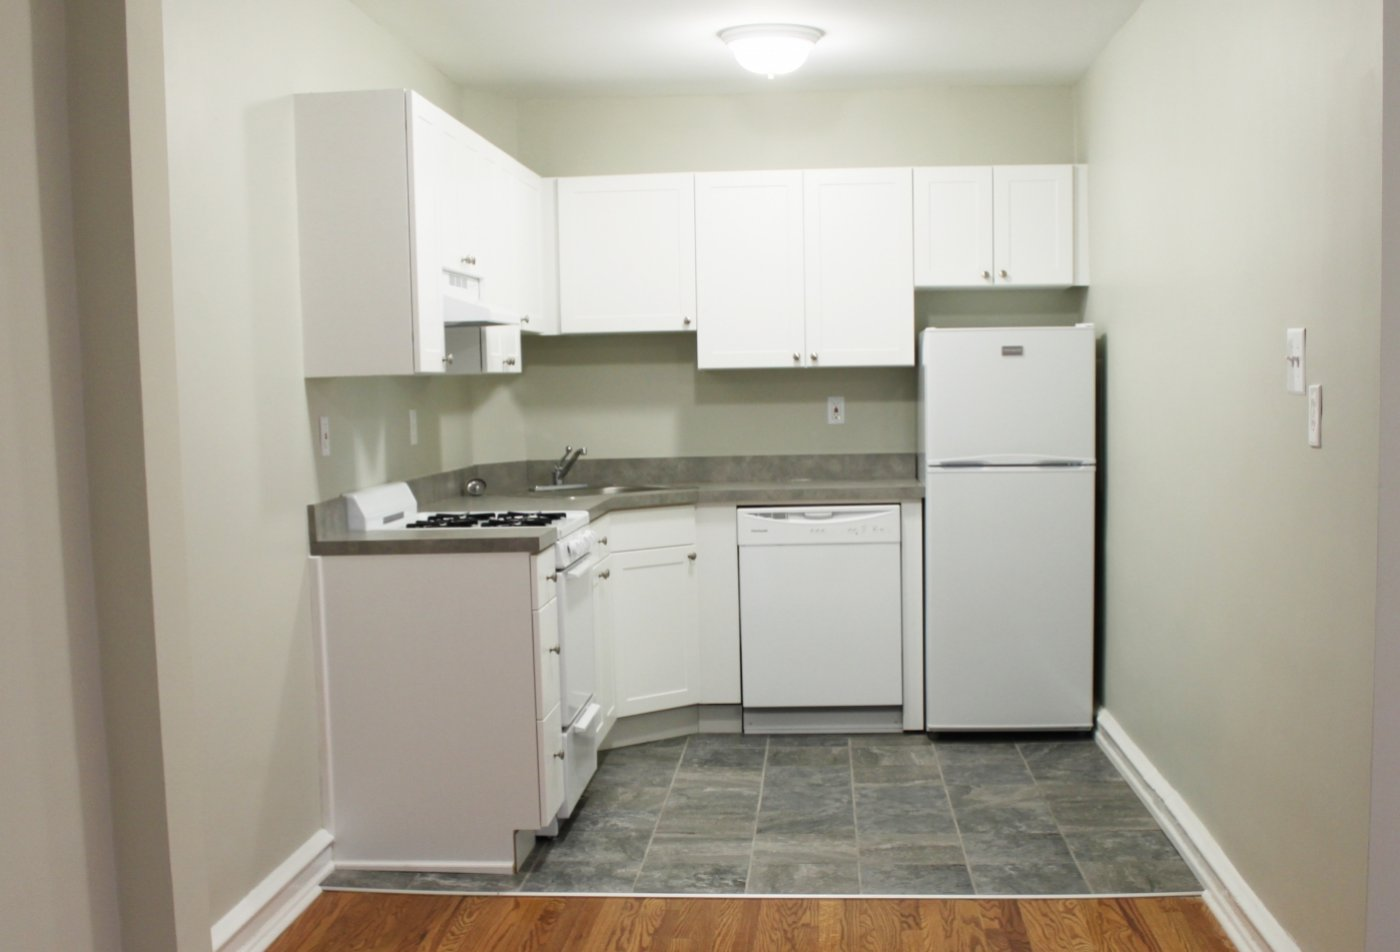 Modern Kitchen | Ardmore PA Apartment For Rent | Suburban Court Apartments